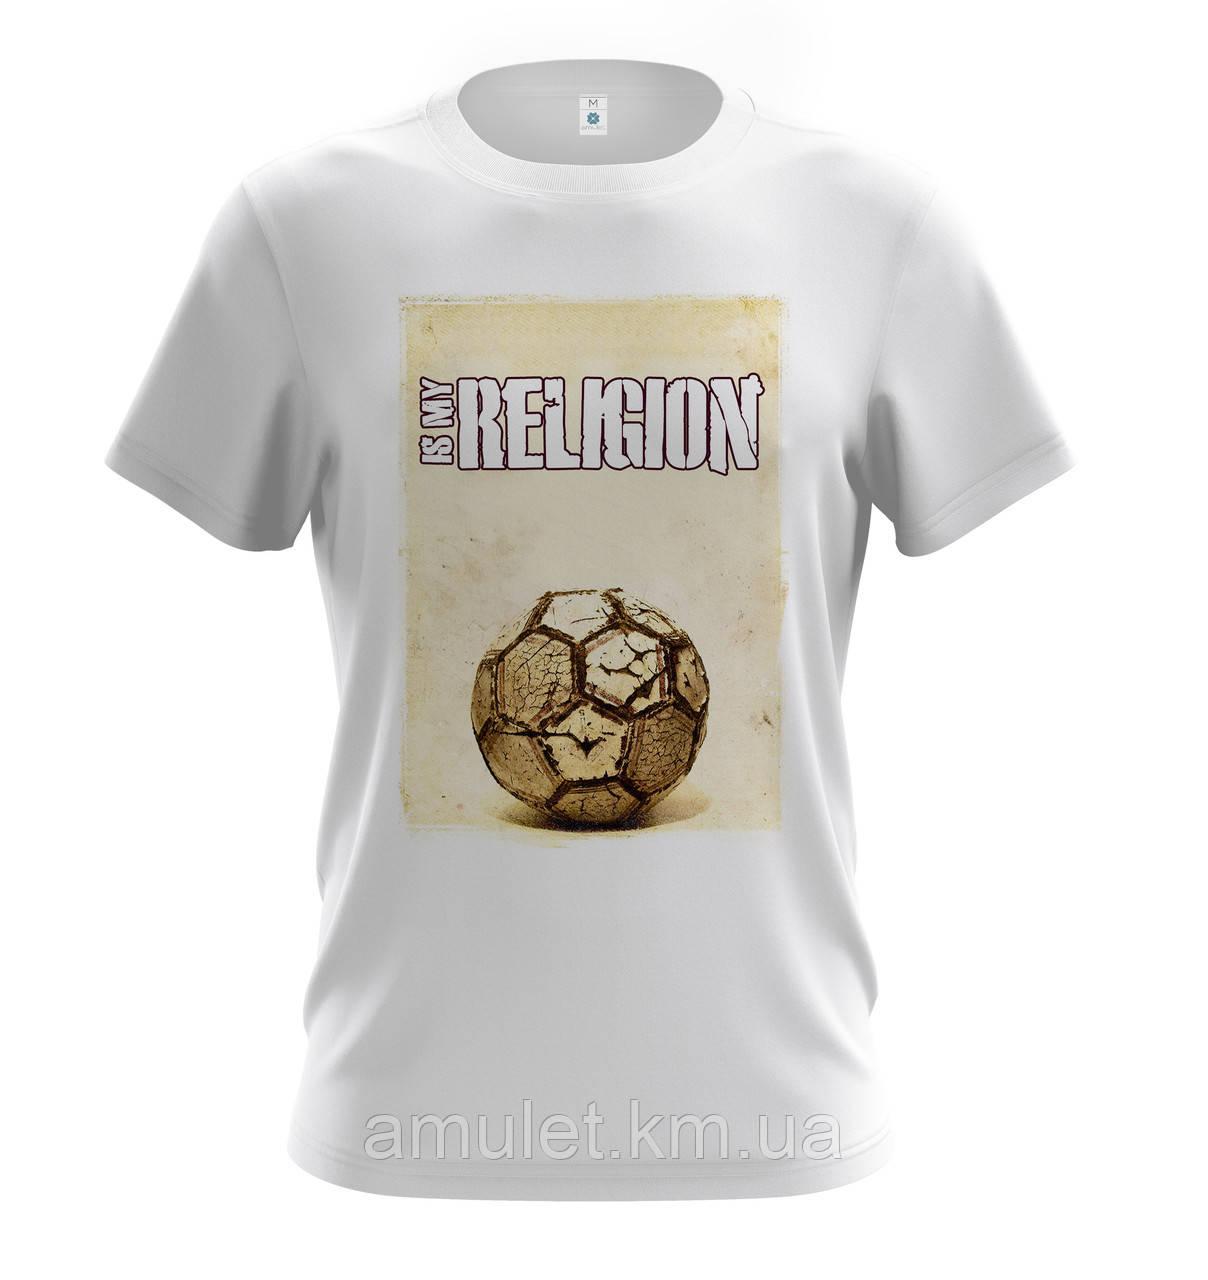 "Мужская молодежная футболка   ""Football - Its my religion"""